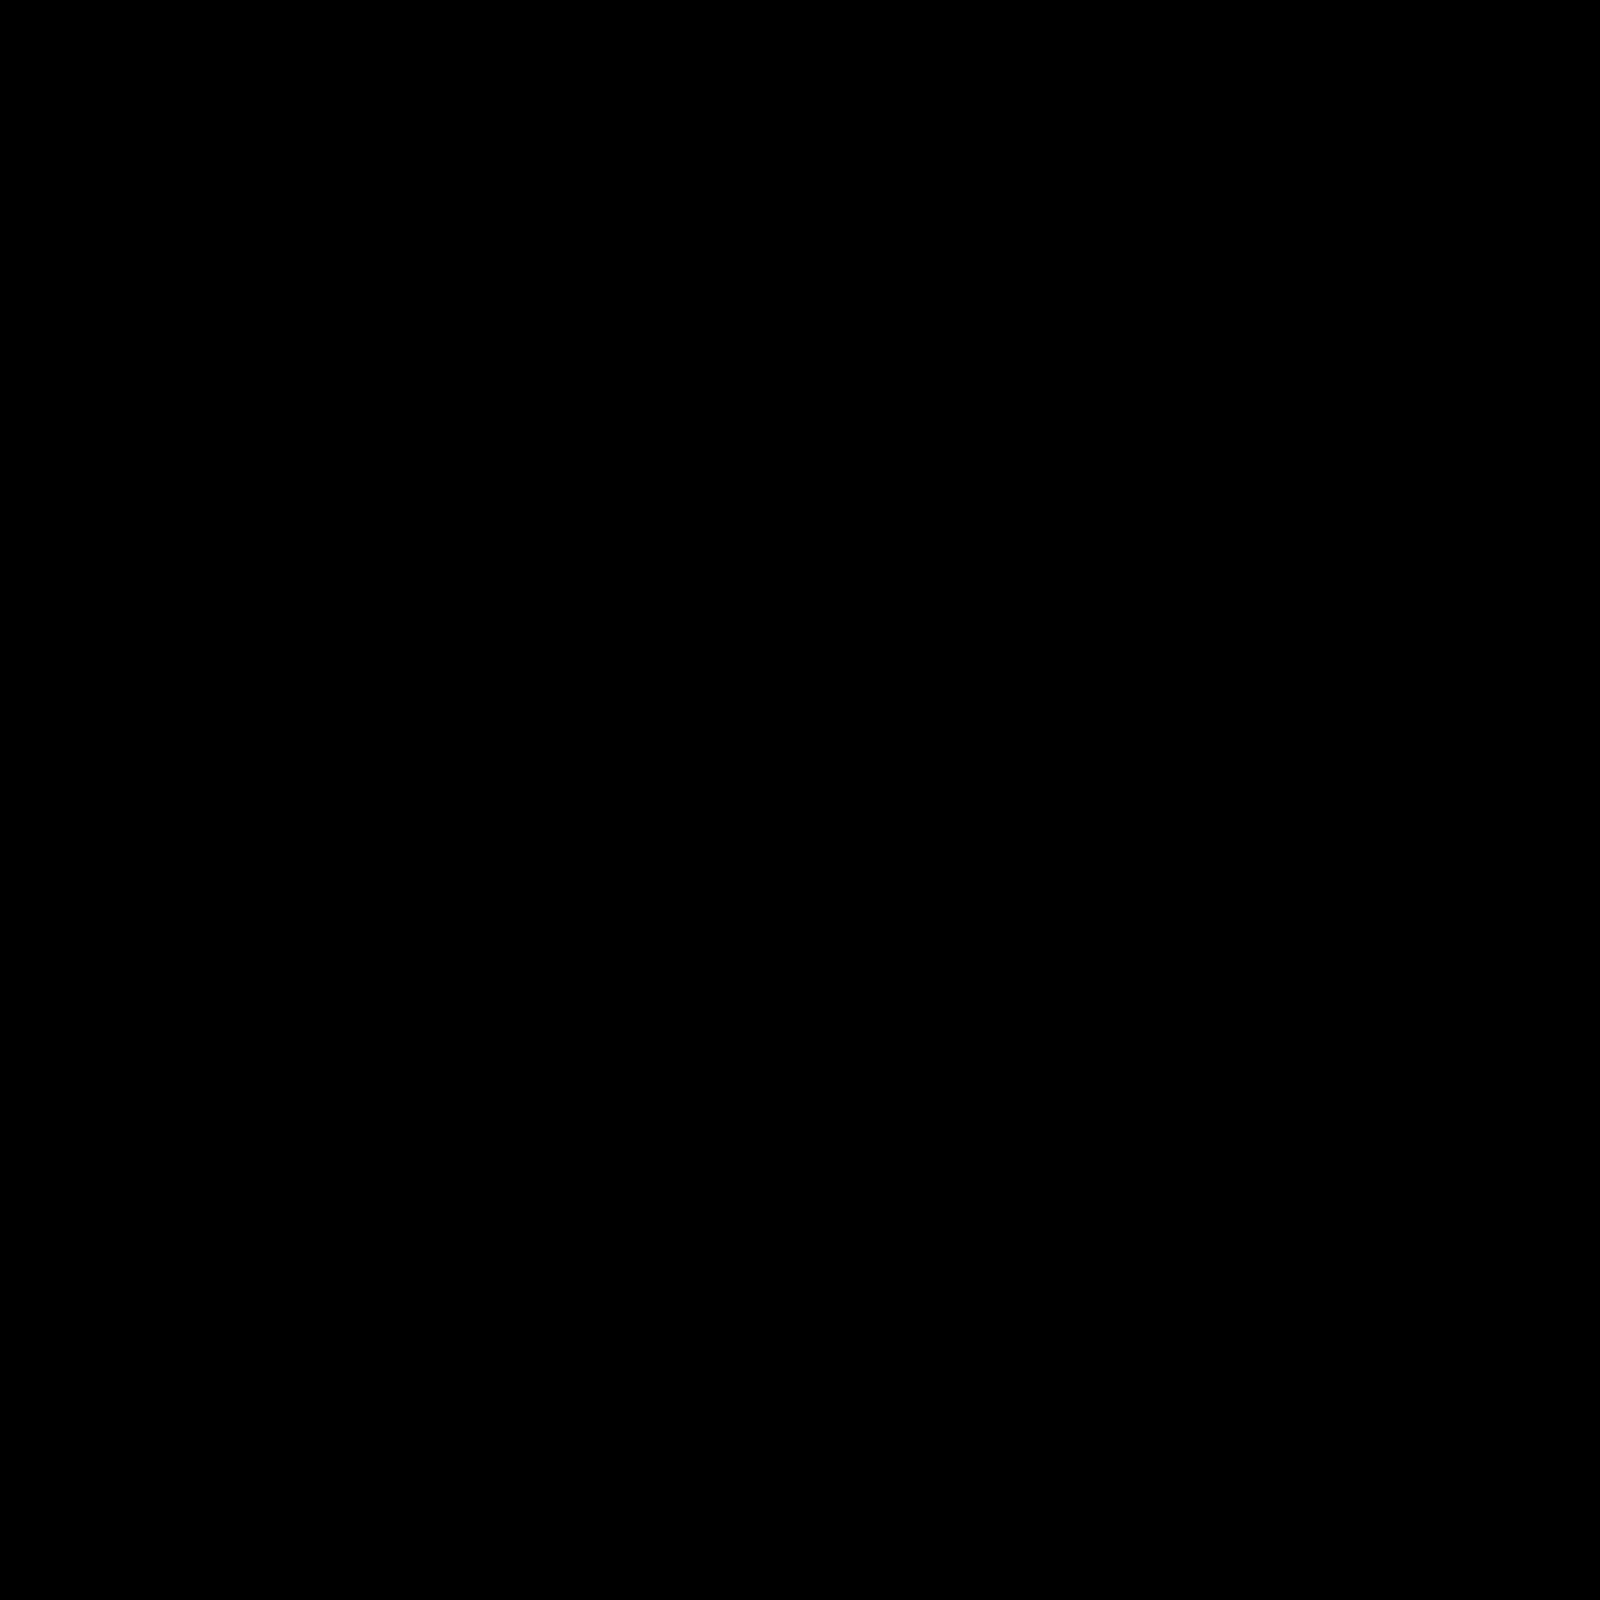 Baza danych icon